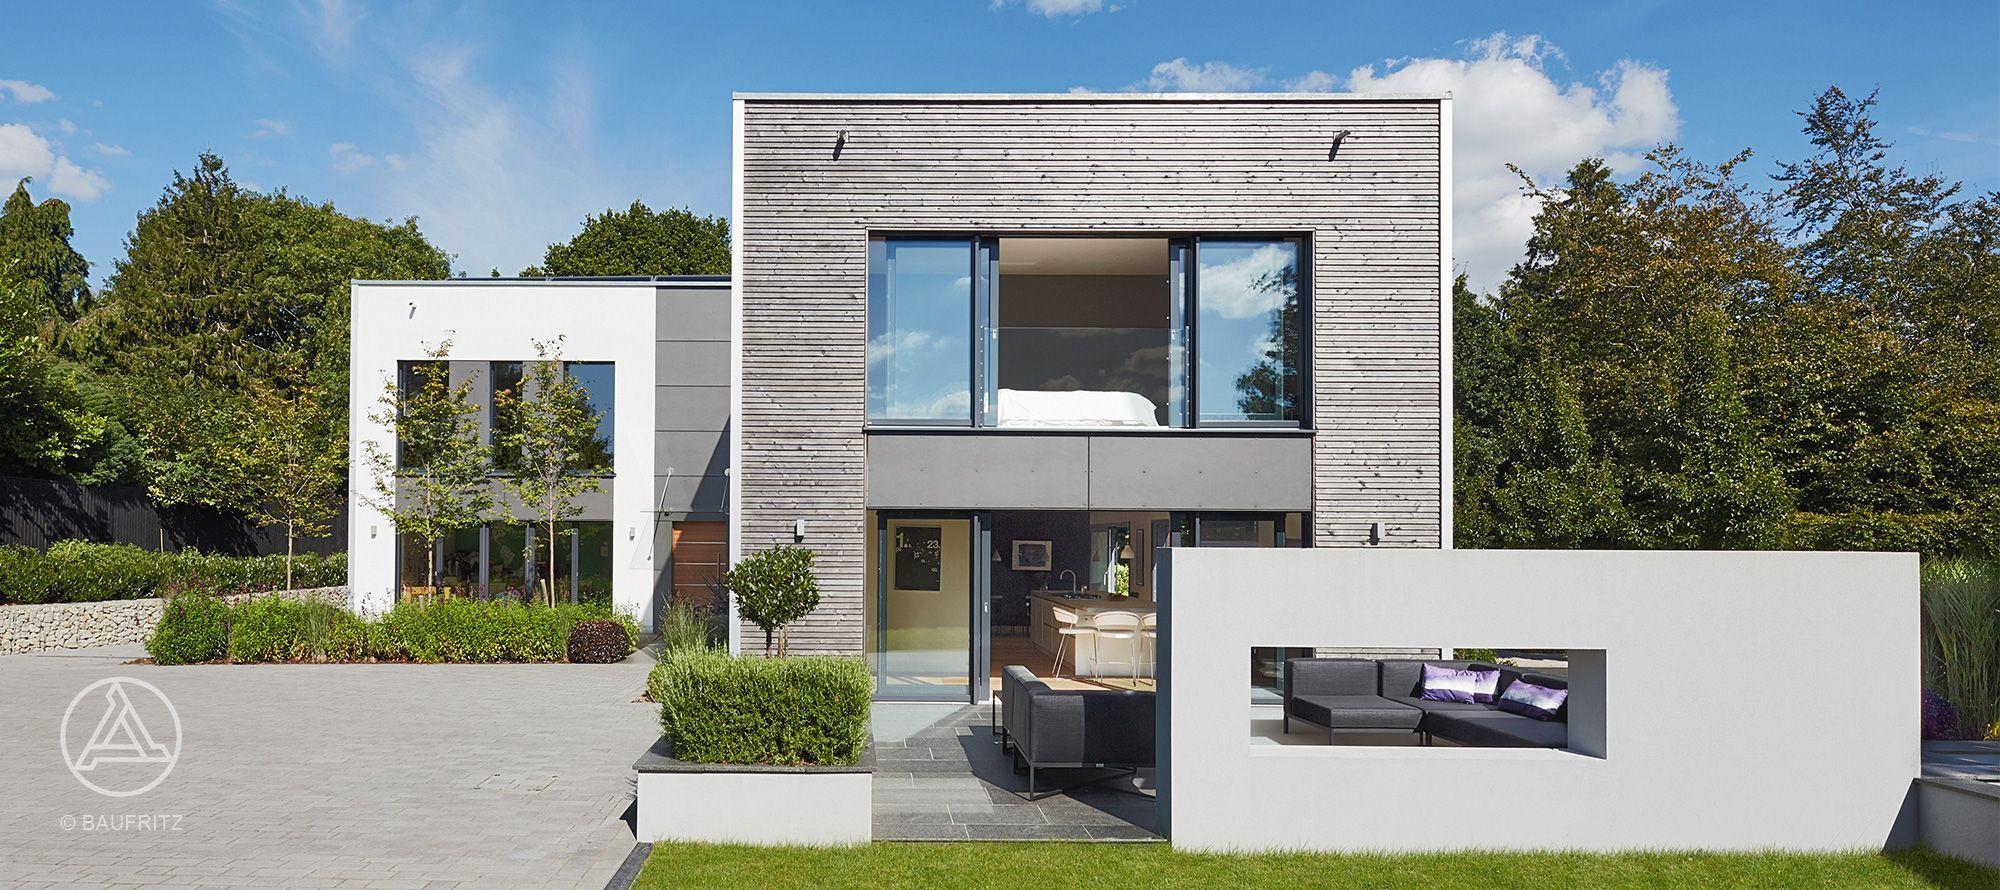 Flat Pack Homes Timber Framed Prefab Houses Baufritz Uk